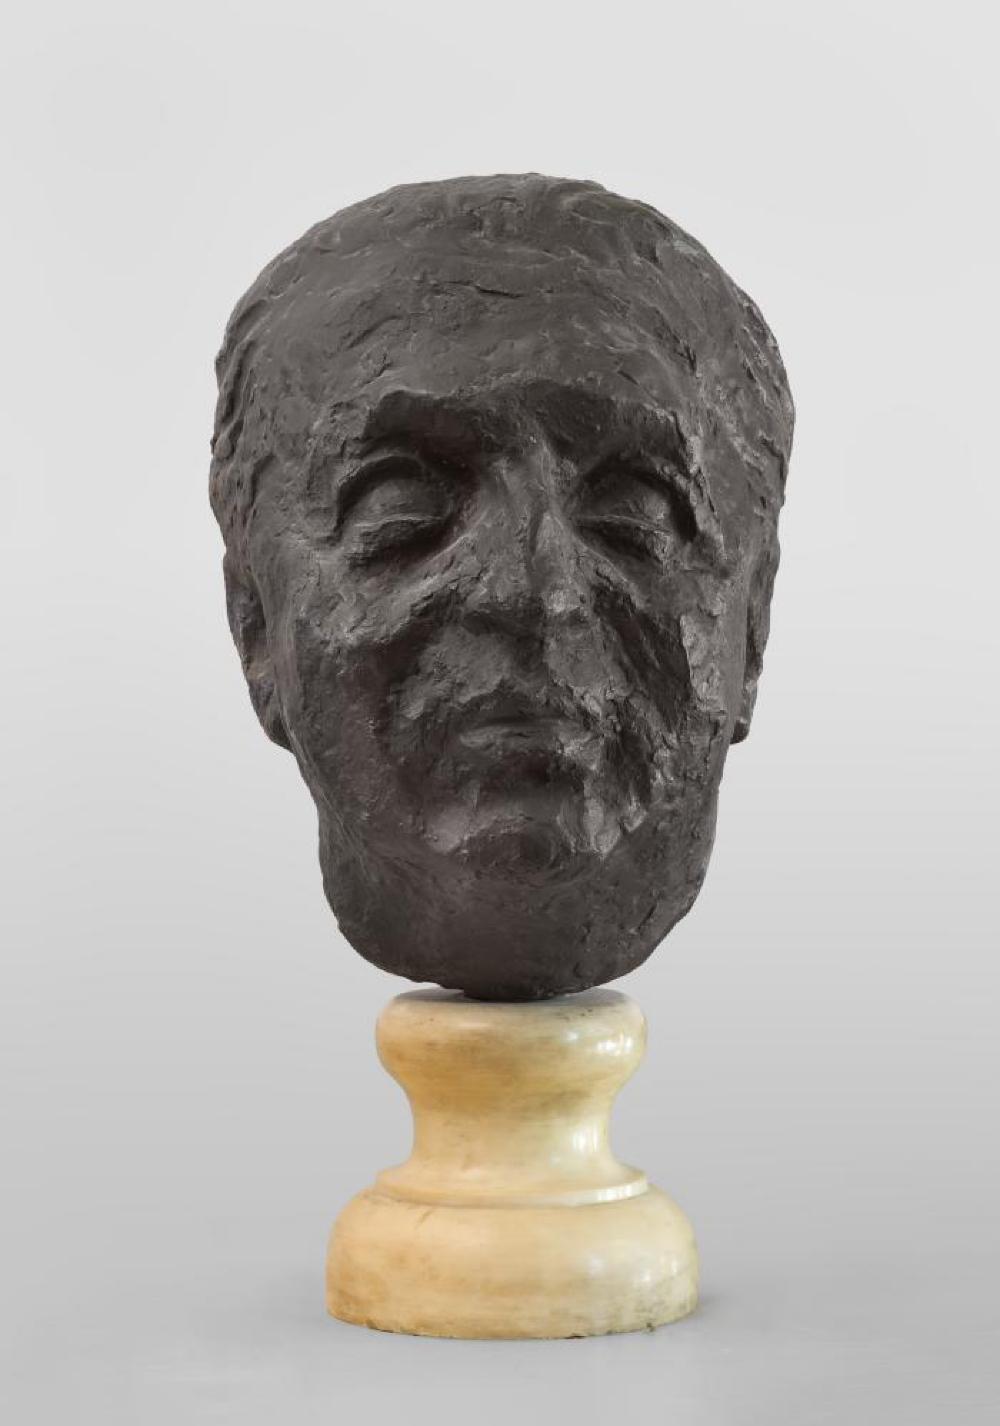 J. B. Neumann, image 3